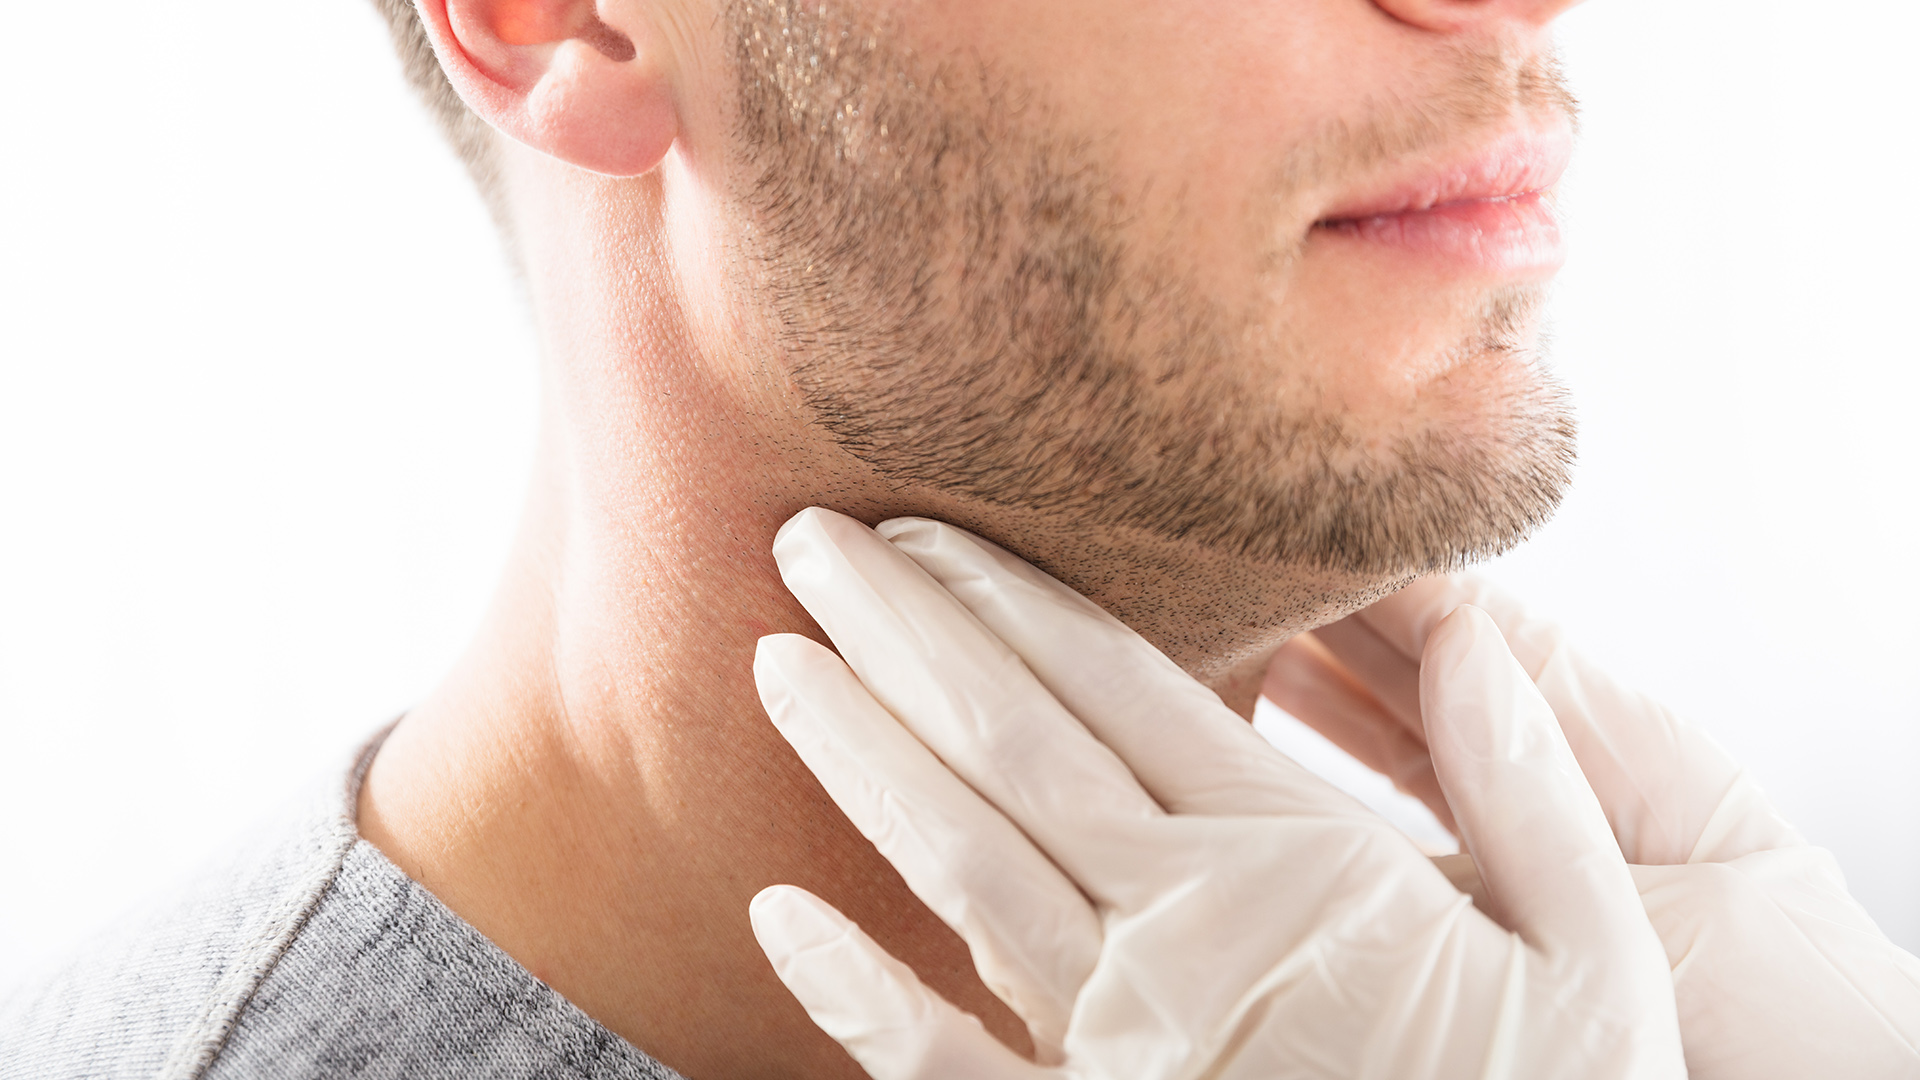 Hipotiroidismo, hipertiroidismo o nódulos en la tiroides: ¿son factores de  riesgo para el COVID-19? - Infobae